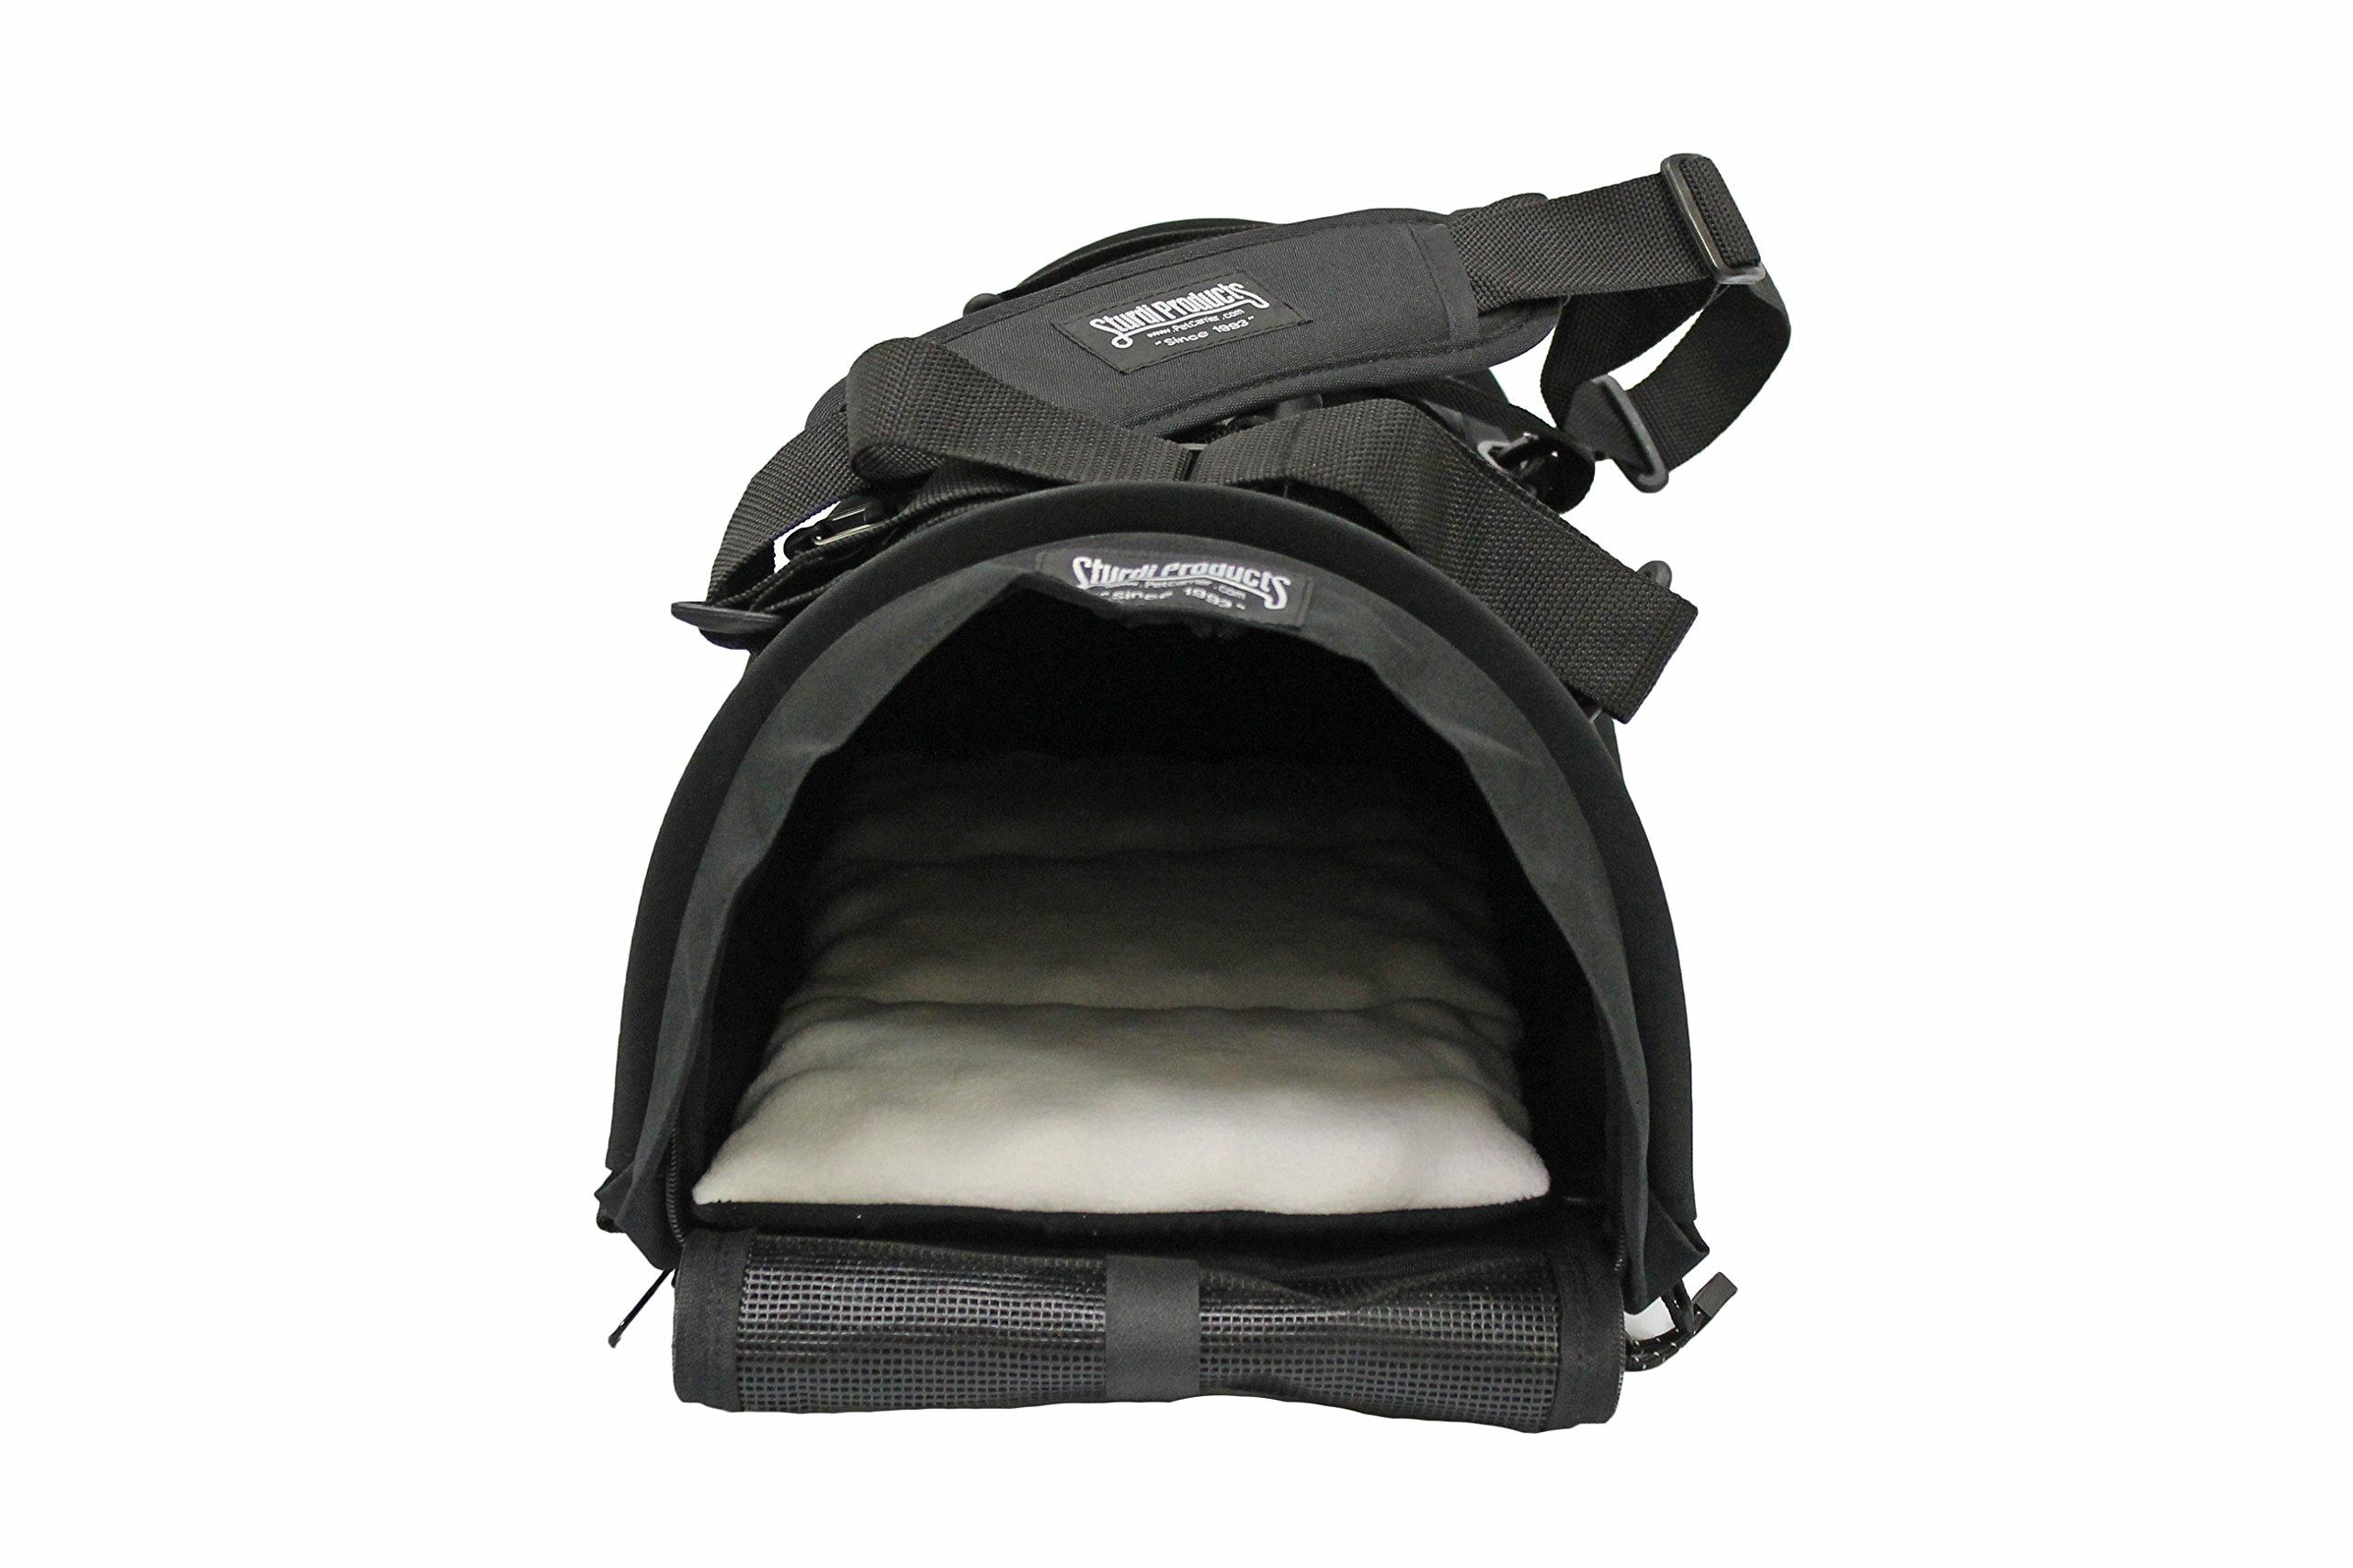 STURDI PRODUCTS Bag Pet Carrier, Small, Black by STURDI PRODUCTS